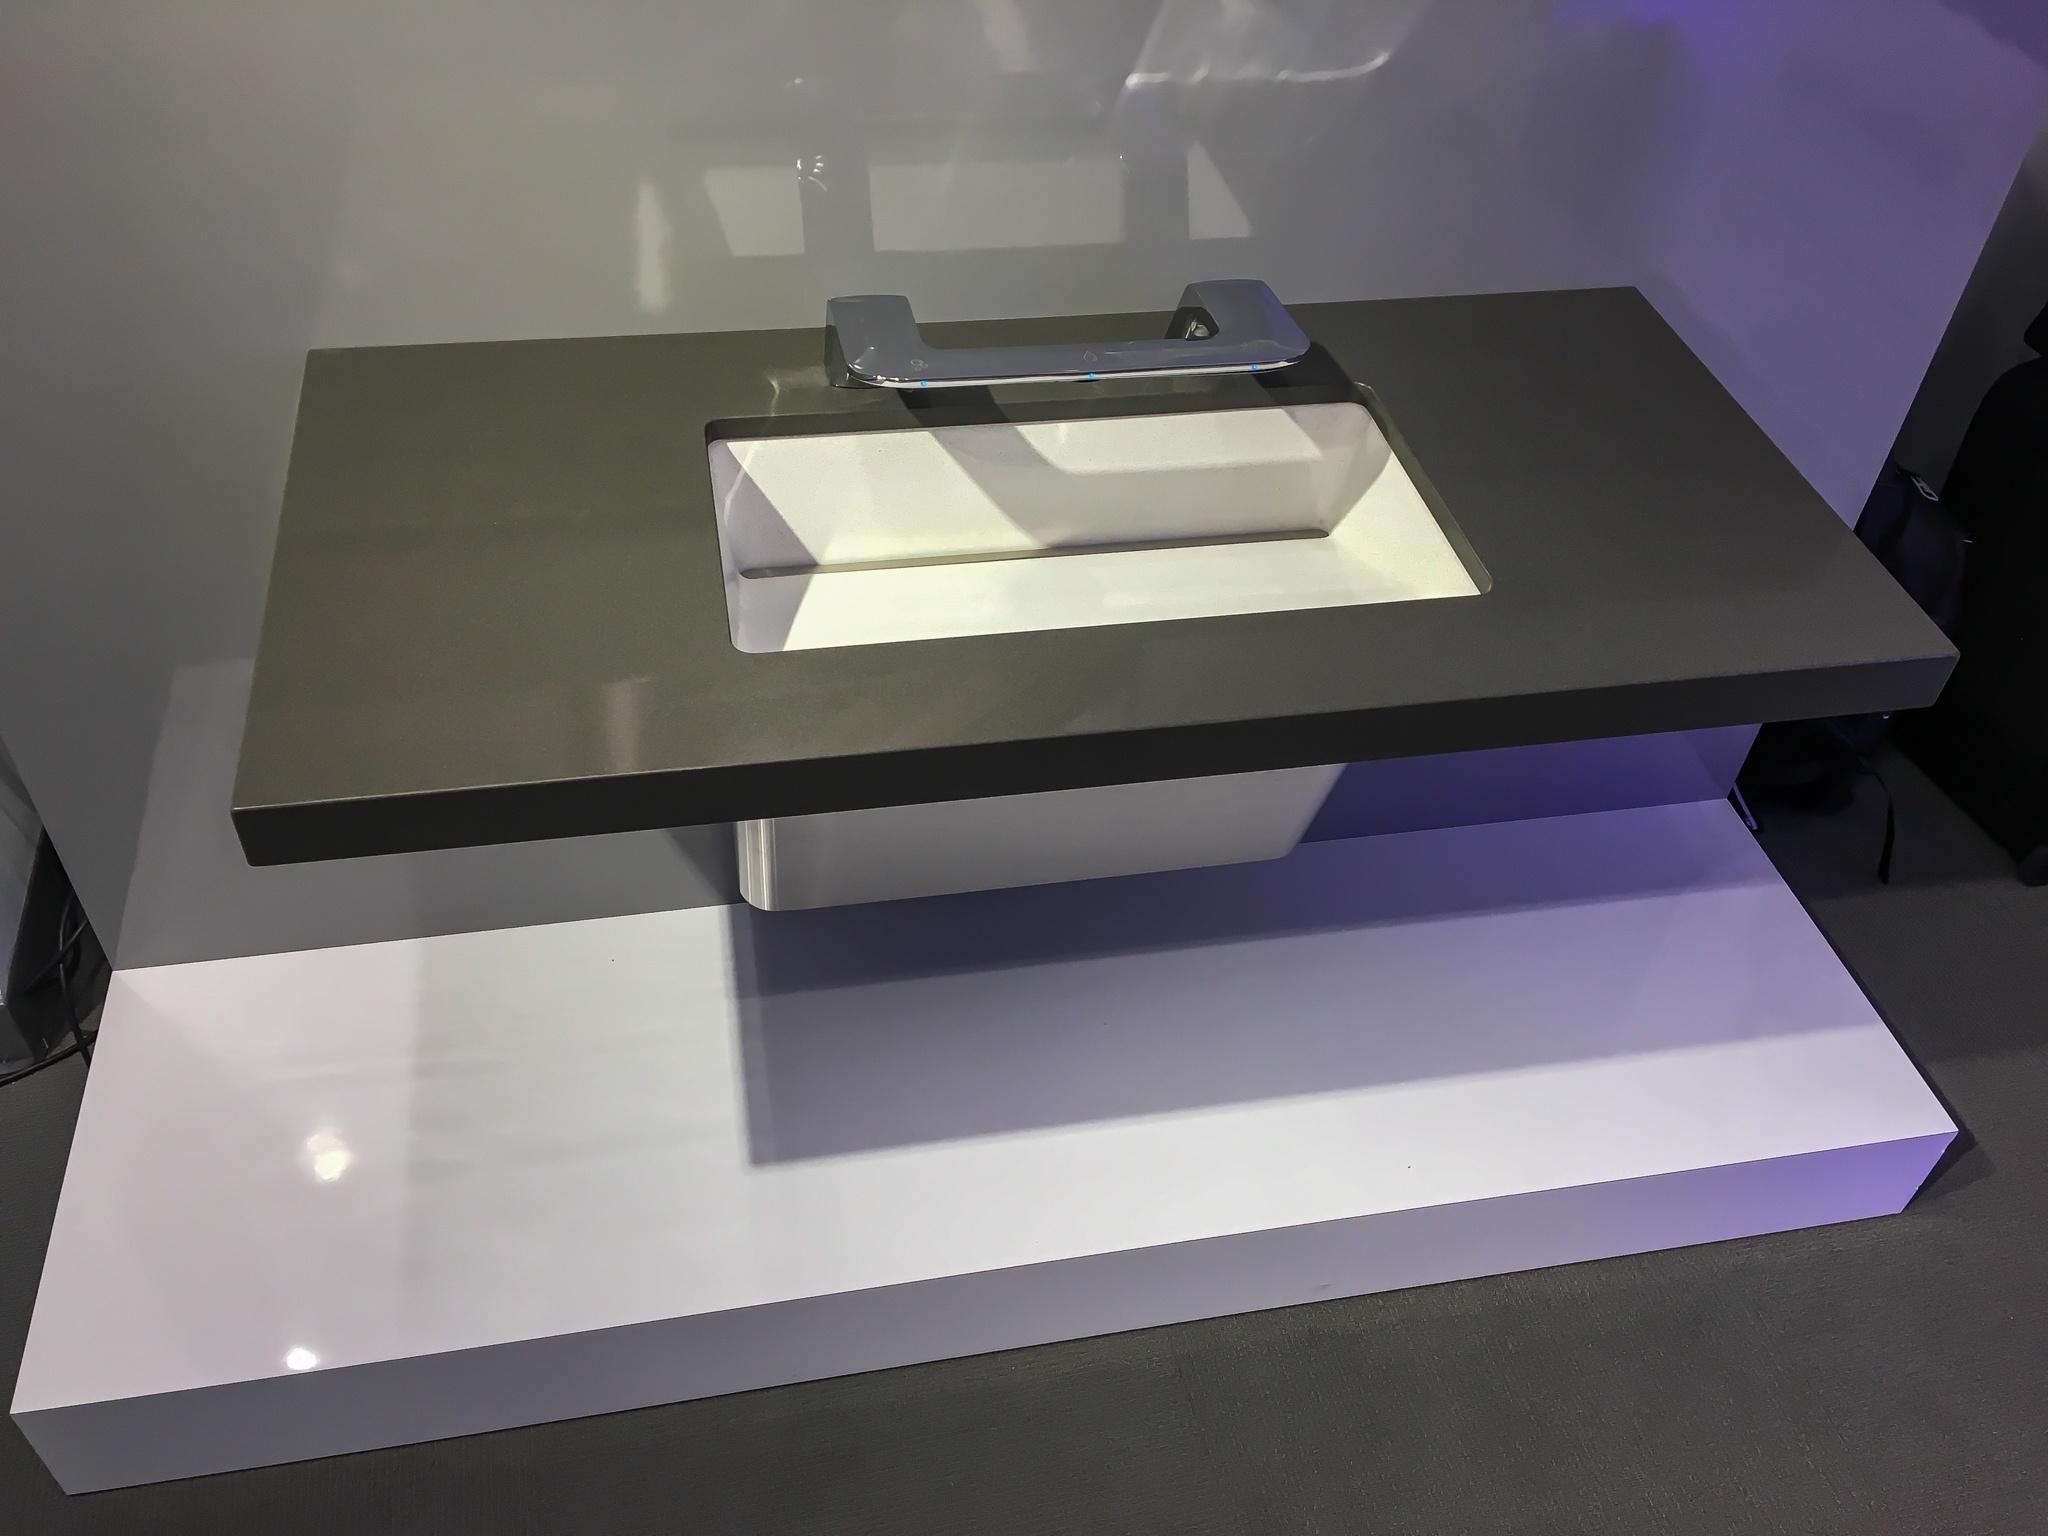 bradley-washbar-LD5010-lavatory-sink-system